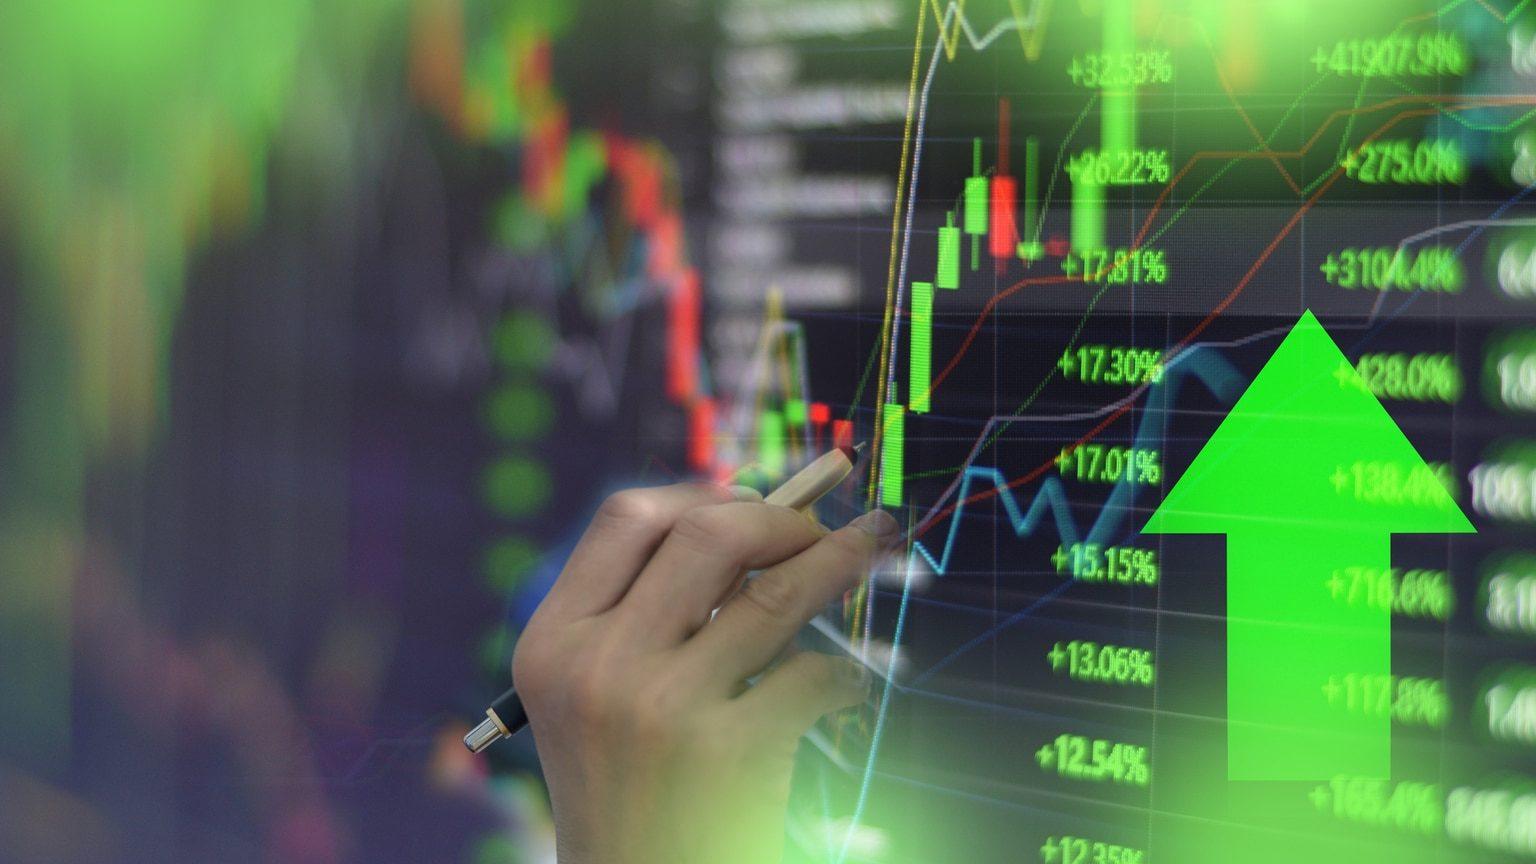 Investment chart showing upward-trending stocks